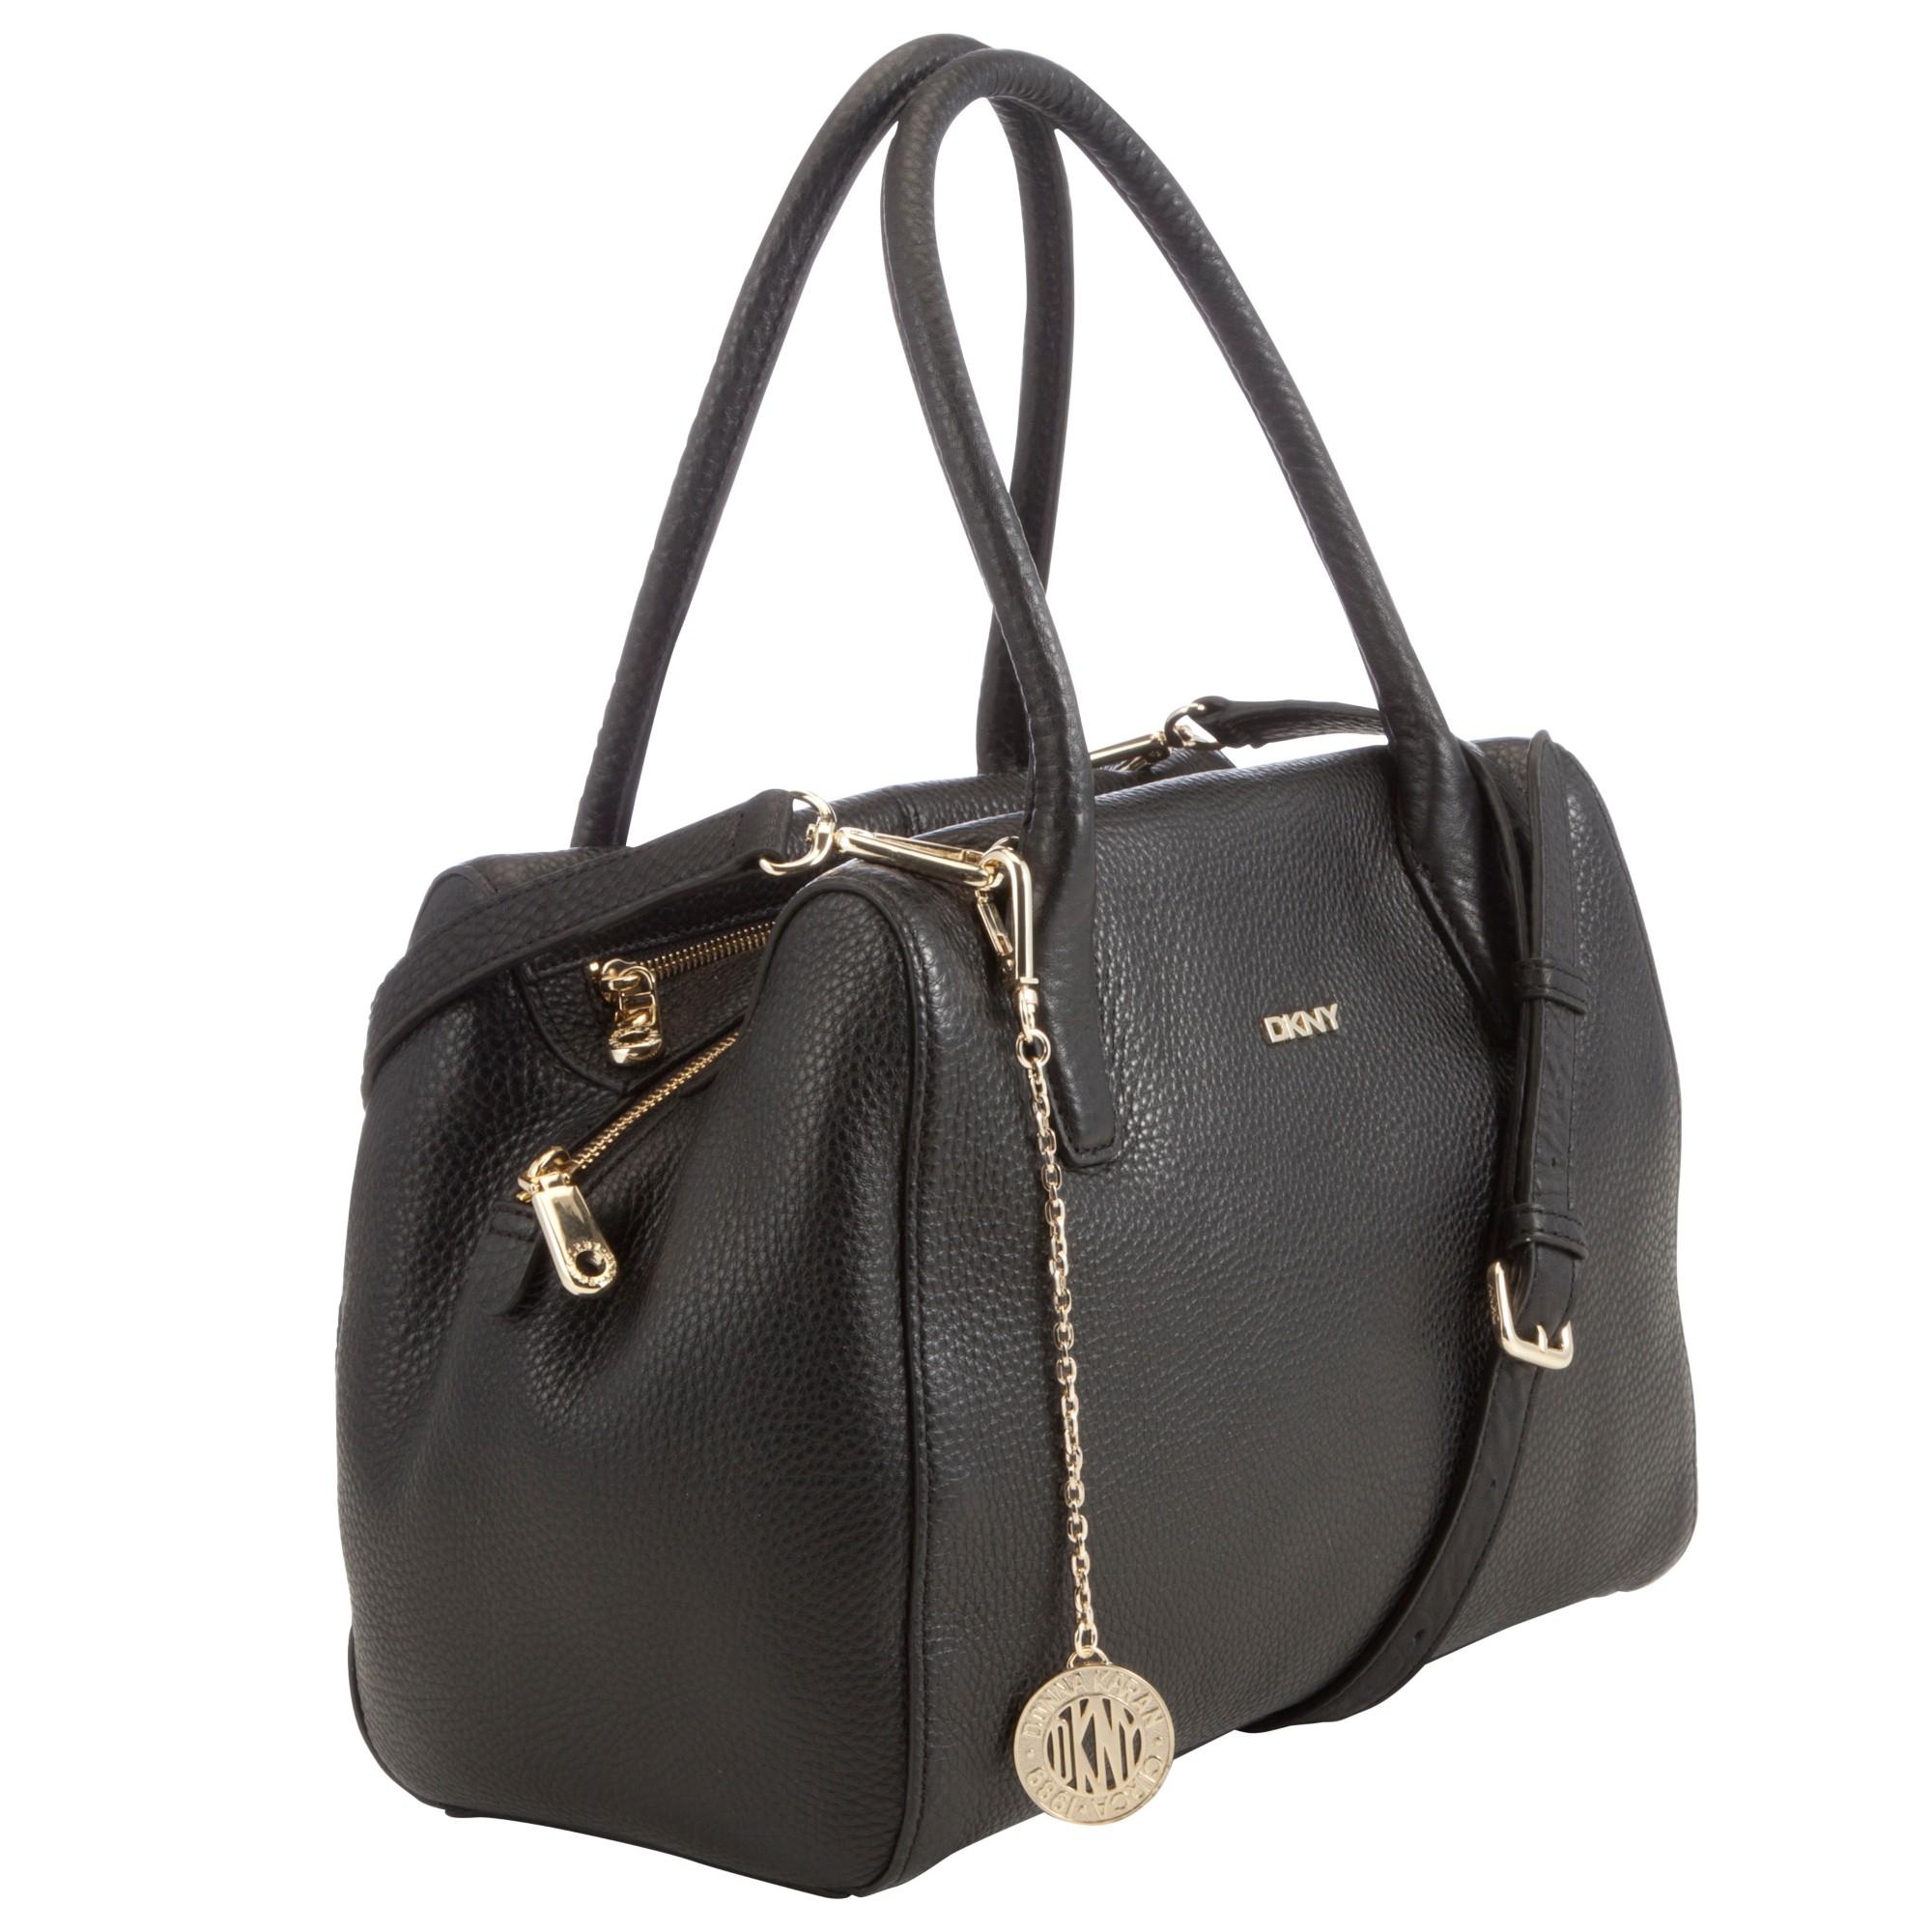 dkny tribeca zip leather satchel bag in black lyst